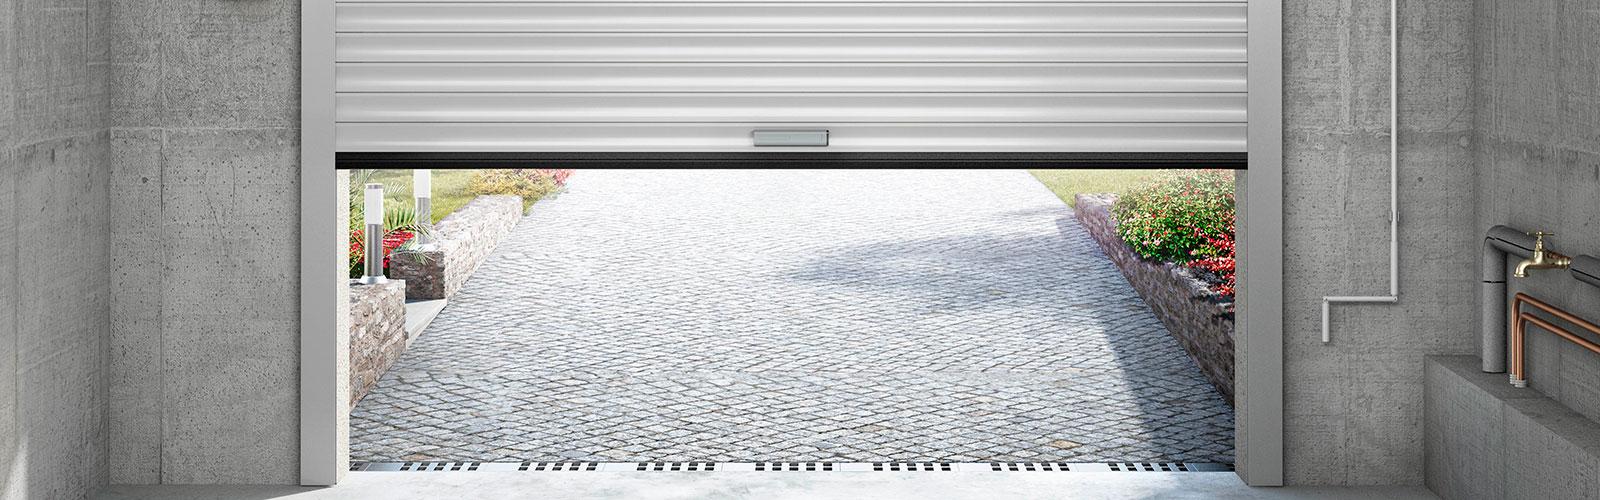 Eveno produits eveno commercialis s par les mat riaux for Porte de garage eveno